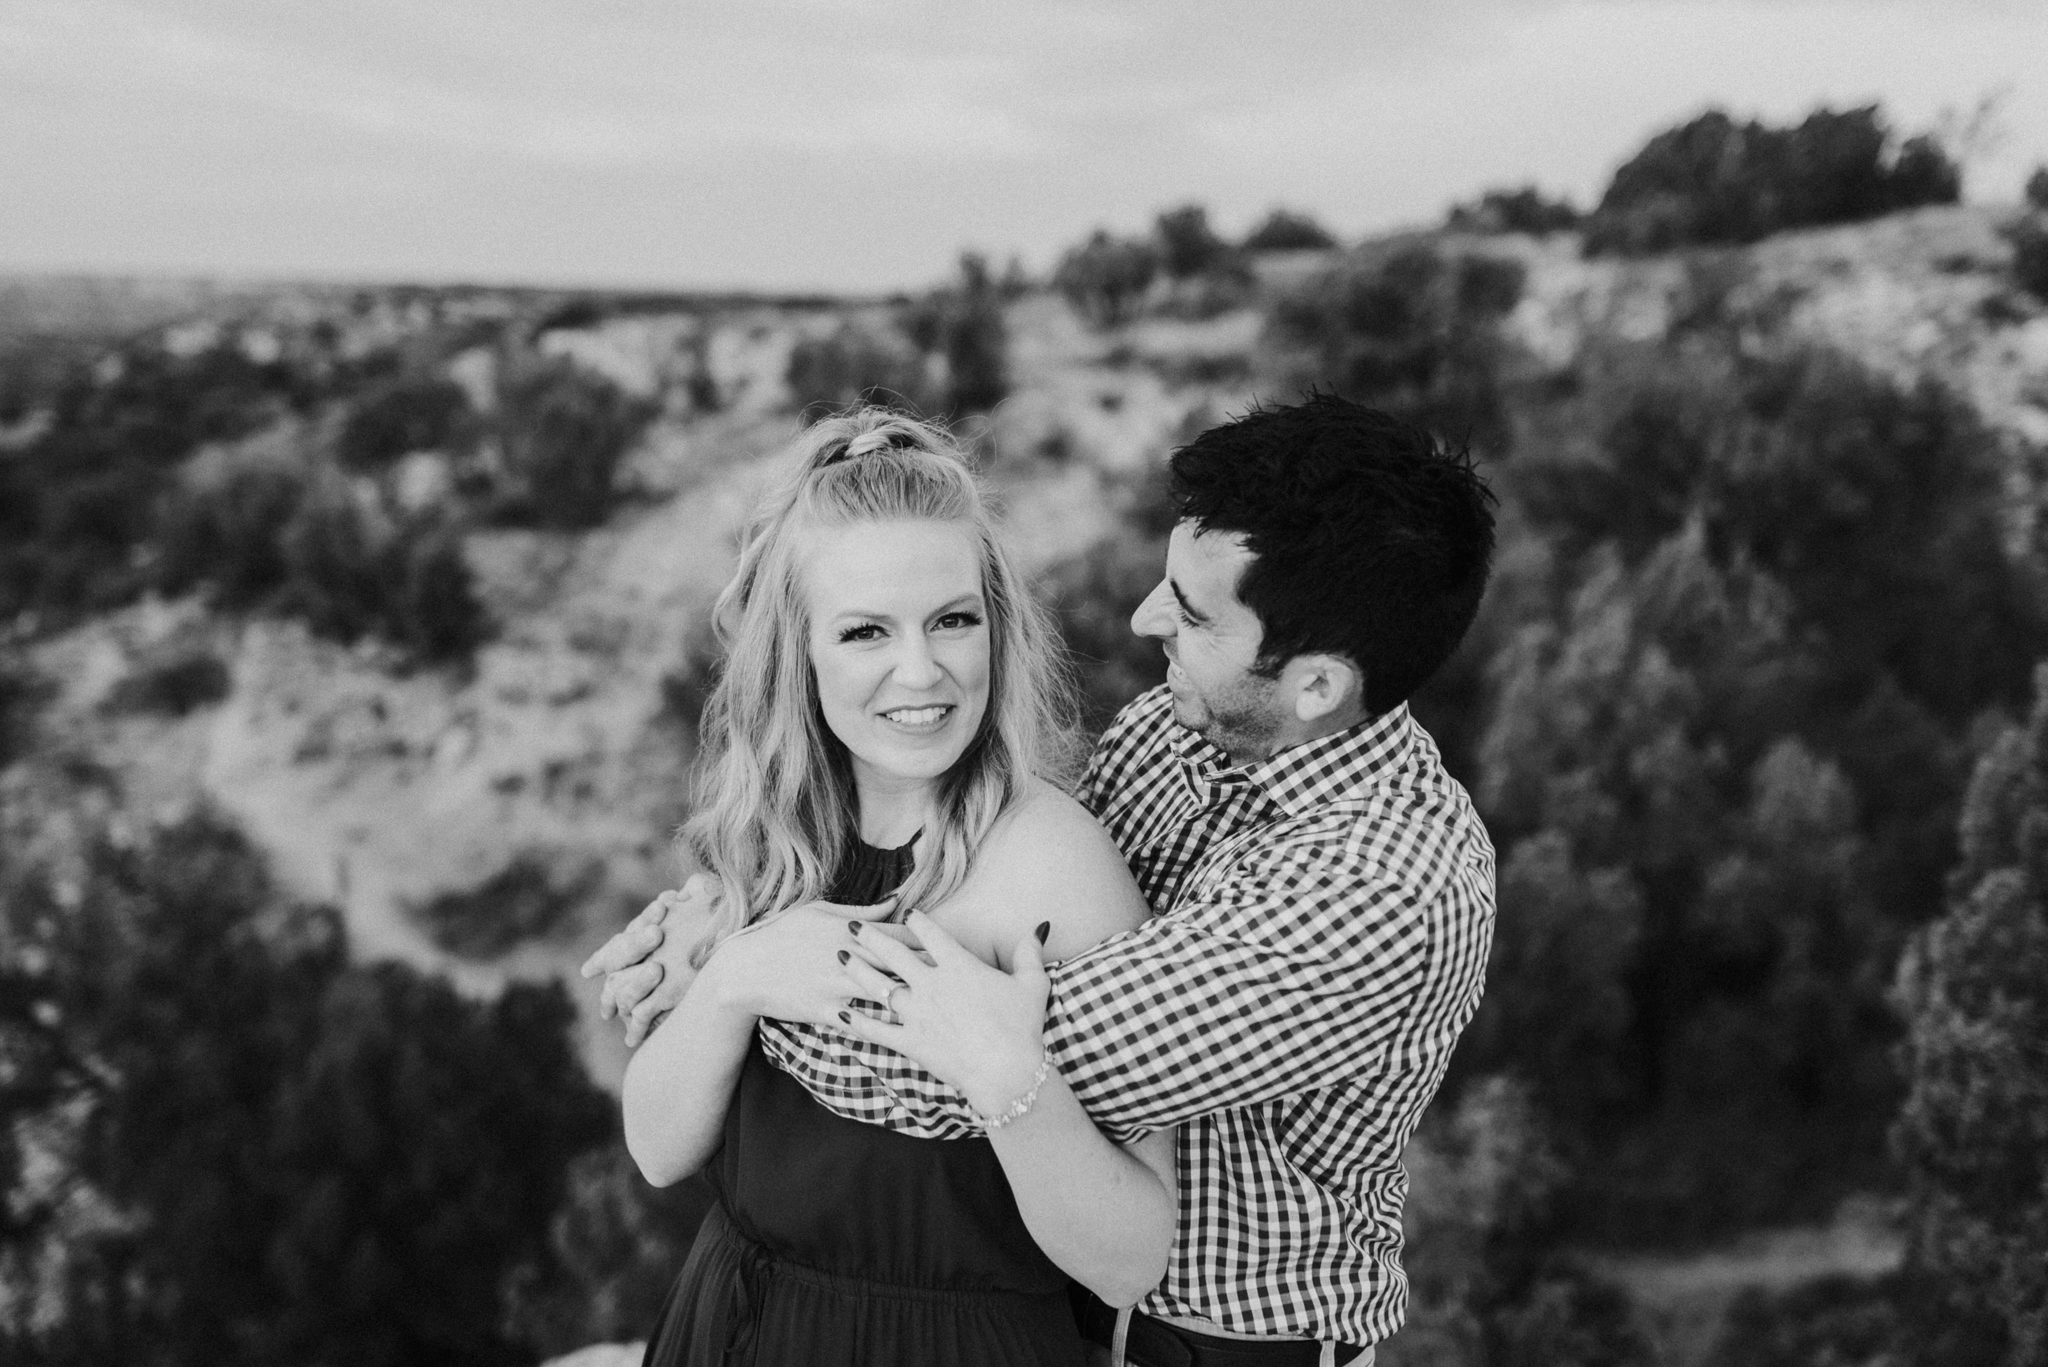 Houston Wedding Photographer-Palo Duro Canyon Engagement Session- Houston Wedding Photographer -Kristen Giles Photography-7.jpg